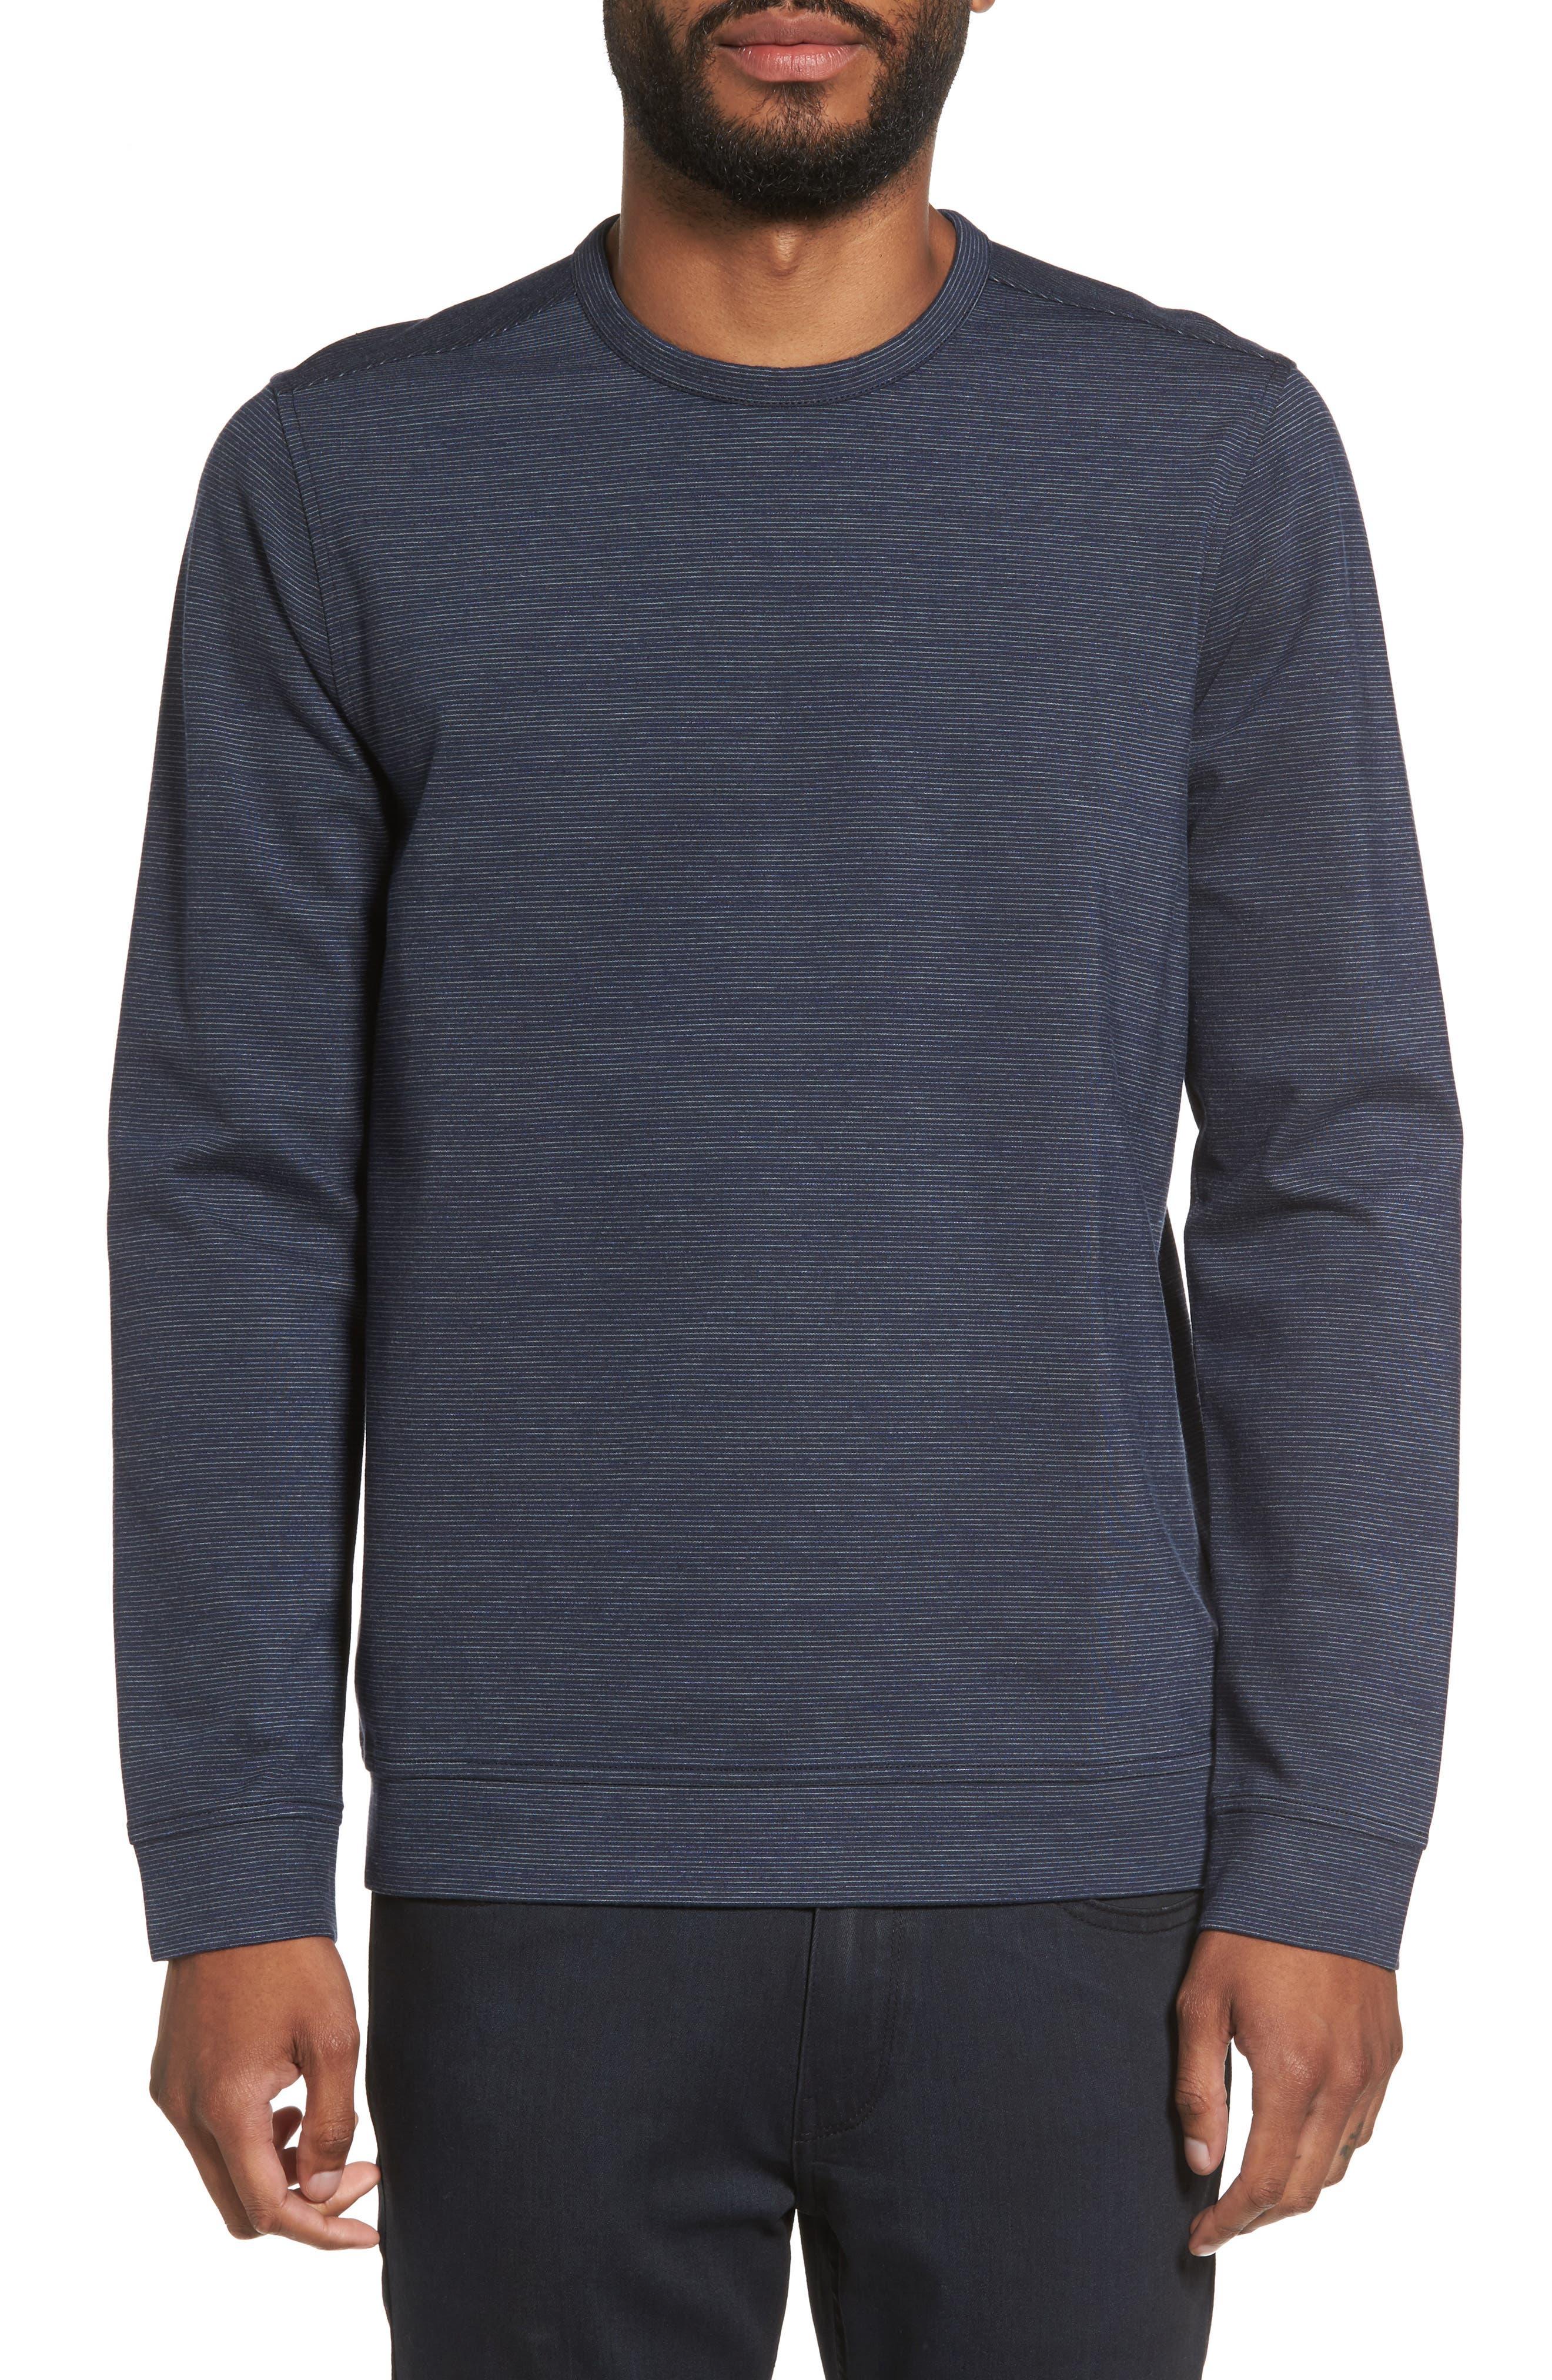 Space Dye Stripe Sweatshirt,                         Main,                         color, Navy Night Spacedye